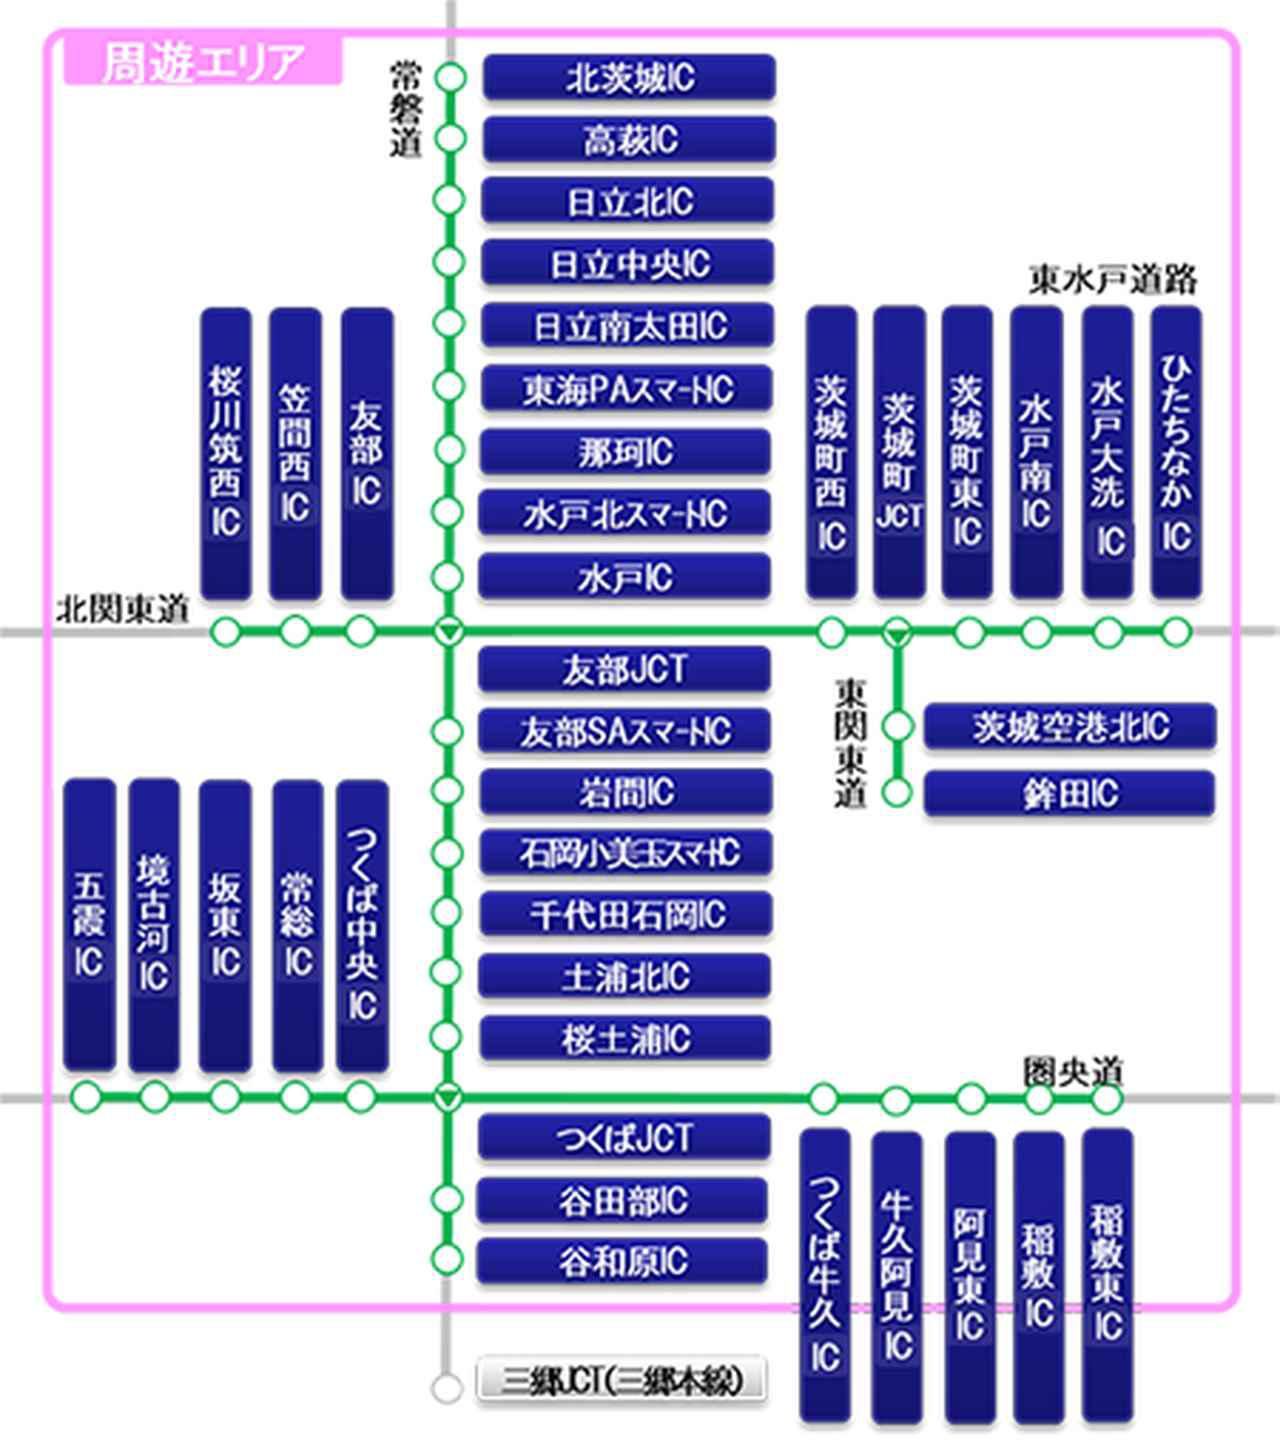 ETCがあれば、茨城県の高速道路を乗り降り自由で3800円! ドラ割「いばらき観光応援フリーパス」の申込受付がスタート